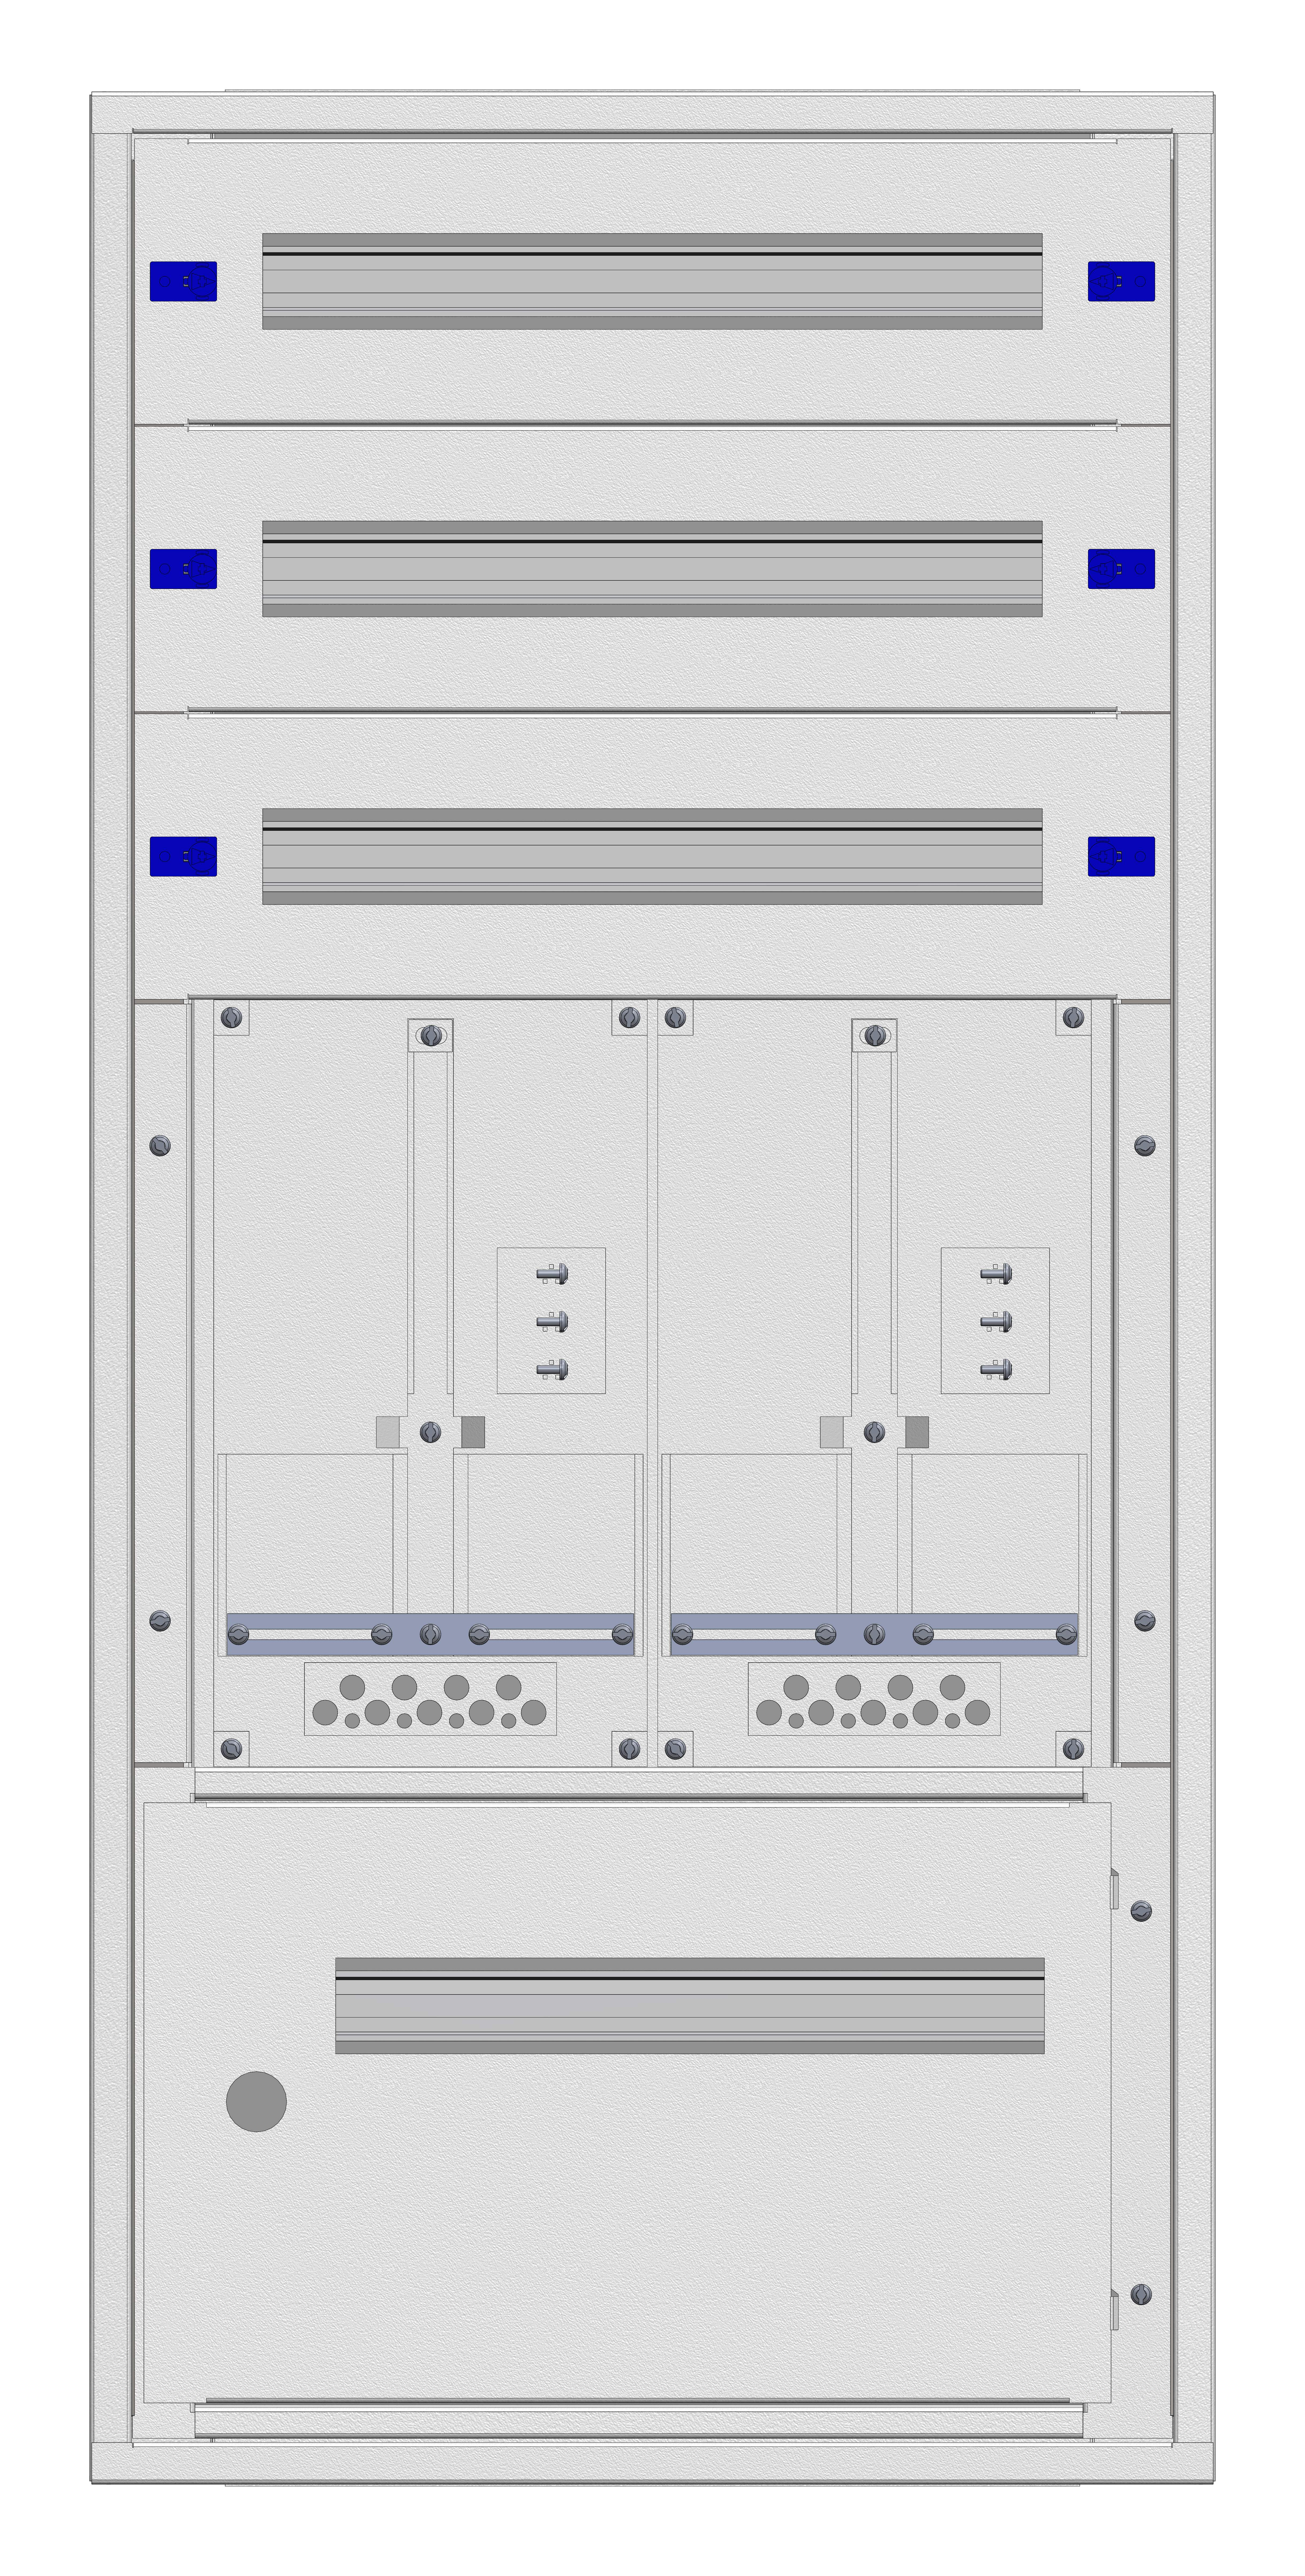 1 Stk Aufputz-Zählerverteiler 2A-24E/STMK 2ZP, H1195B590T250mm IL160224GS